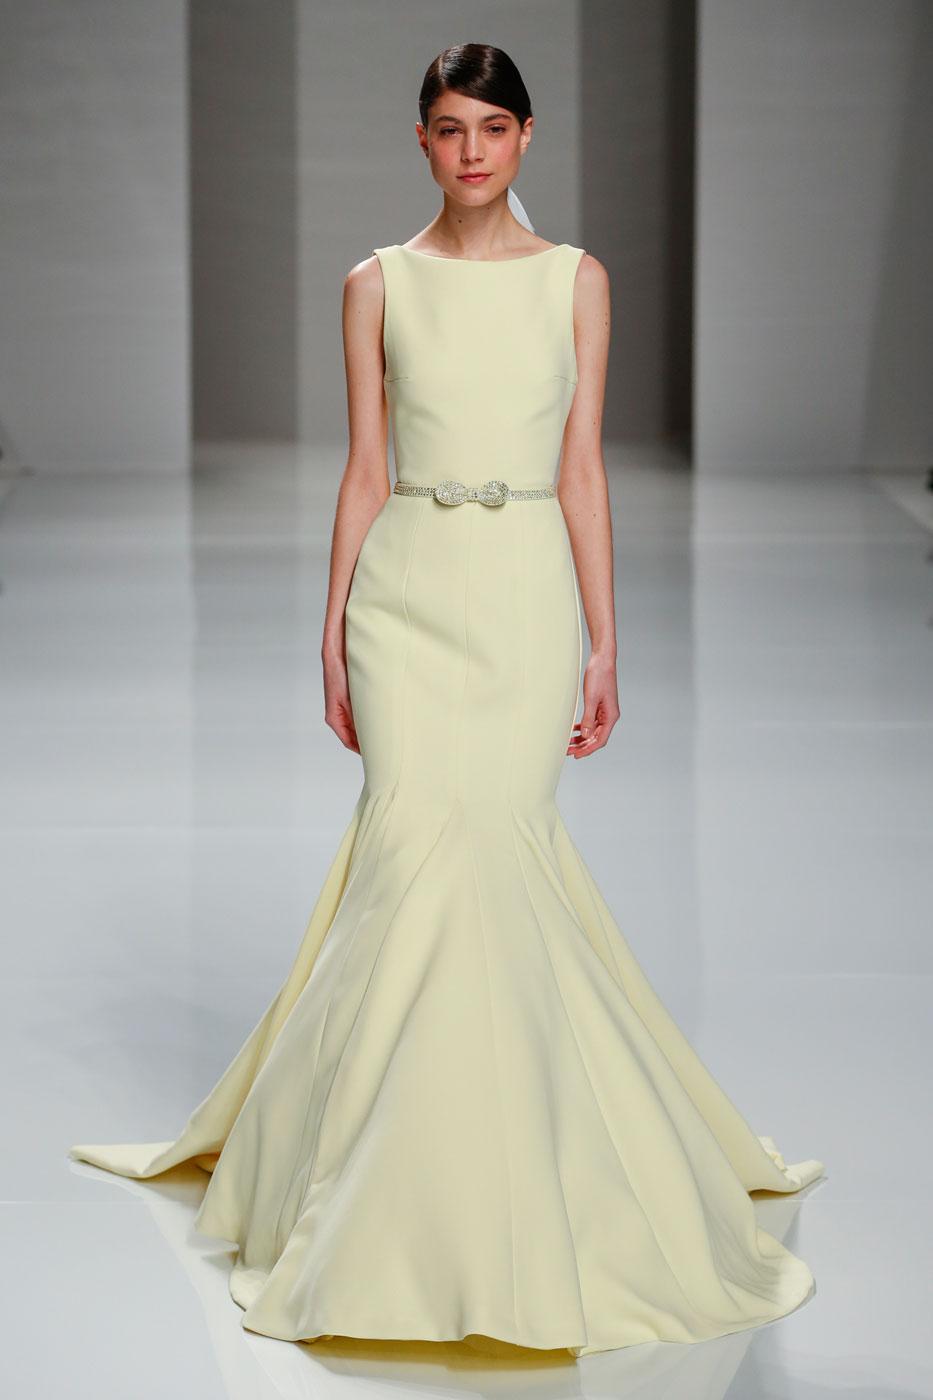 Georges-Hobeika-fashion-runway-show-haute-couture-paris-spring-2015-the-impression-23